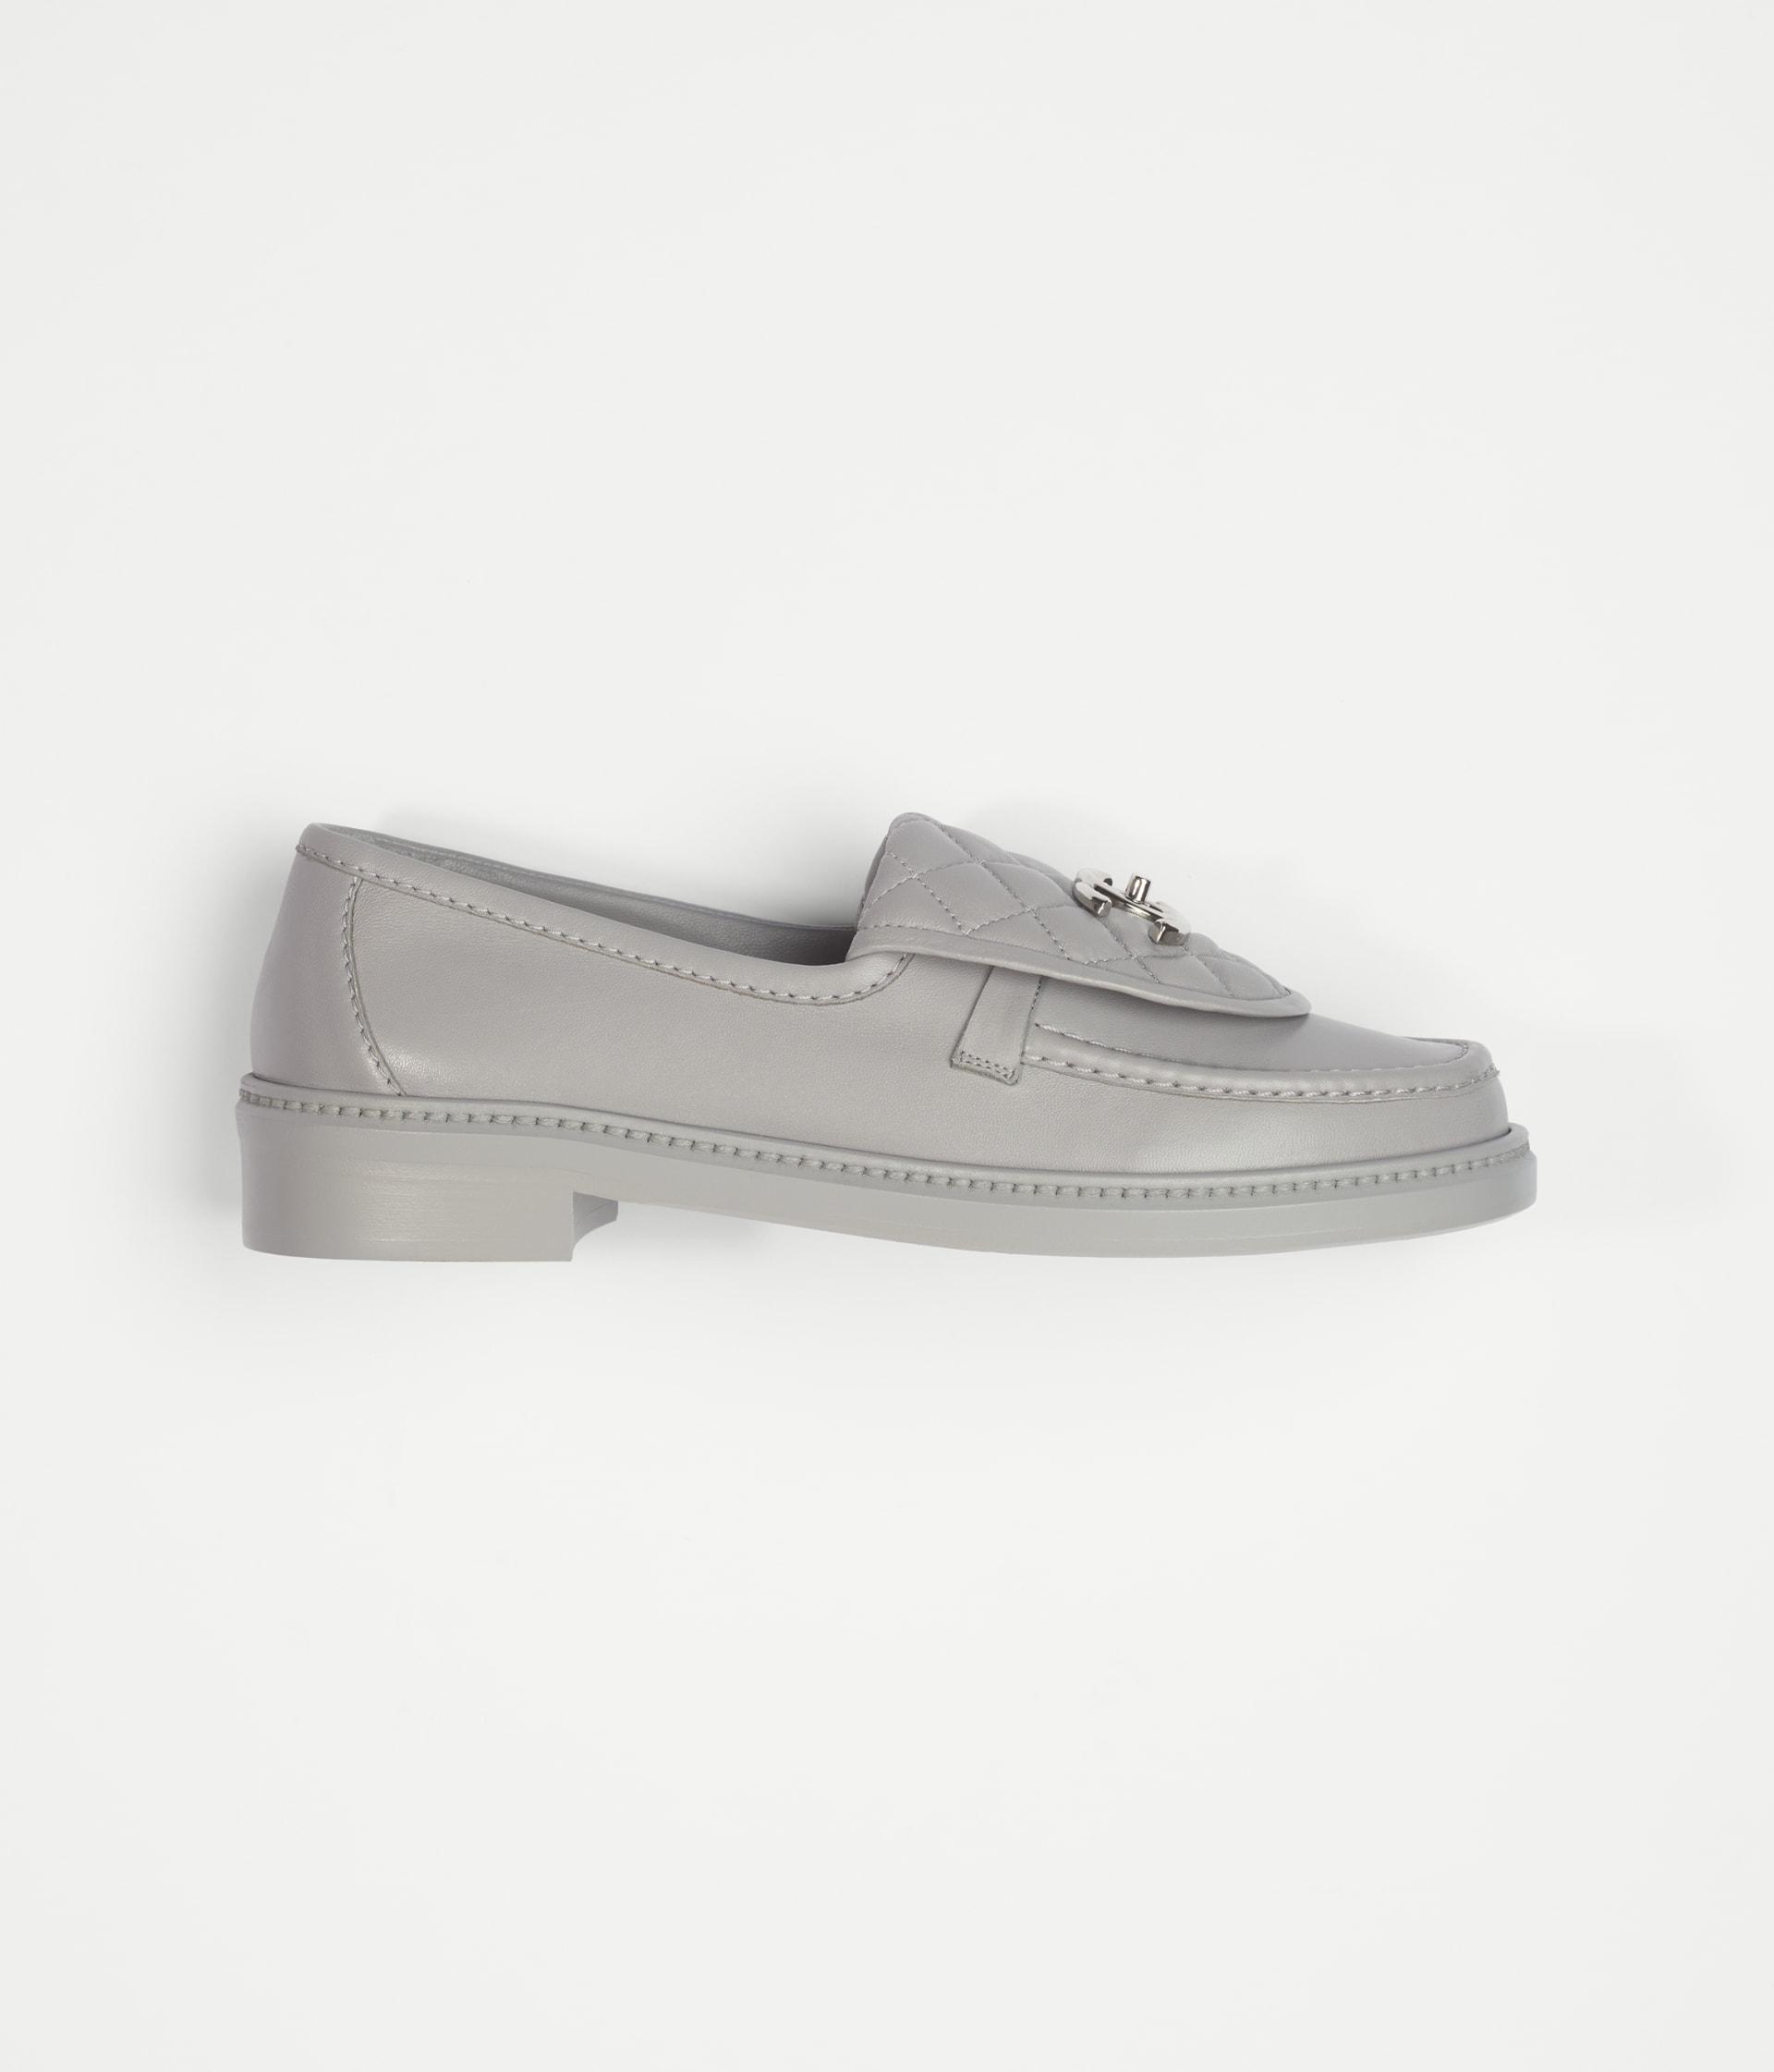 image 1 - Loafers - Lambskin - Gray